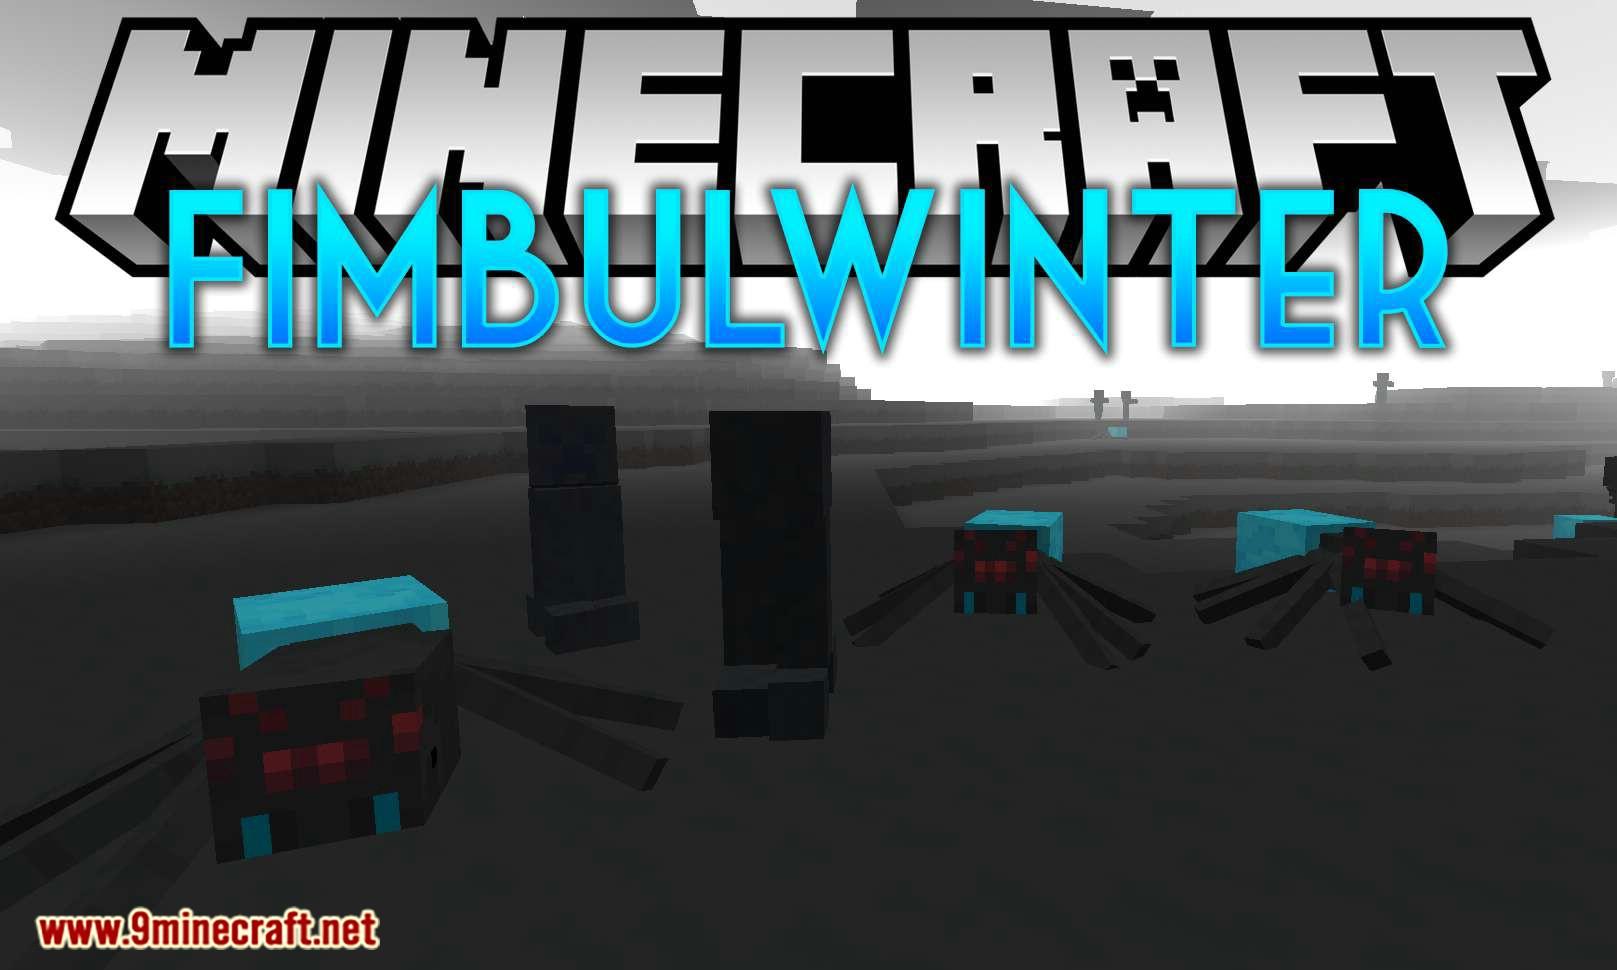 Fimbulwinter mod for minecraft logo